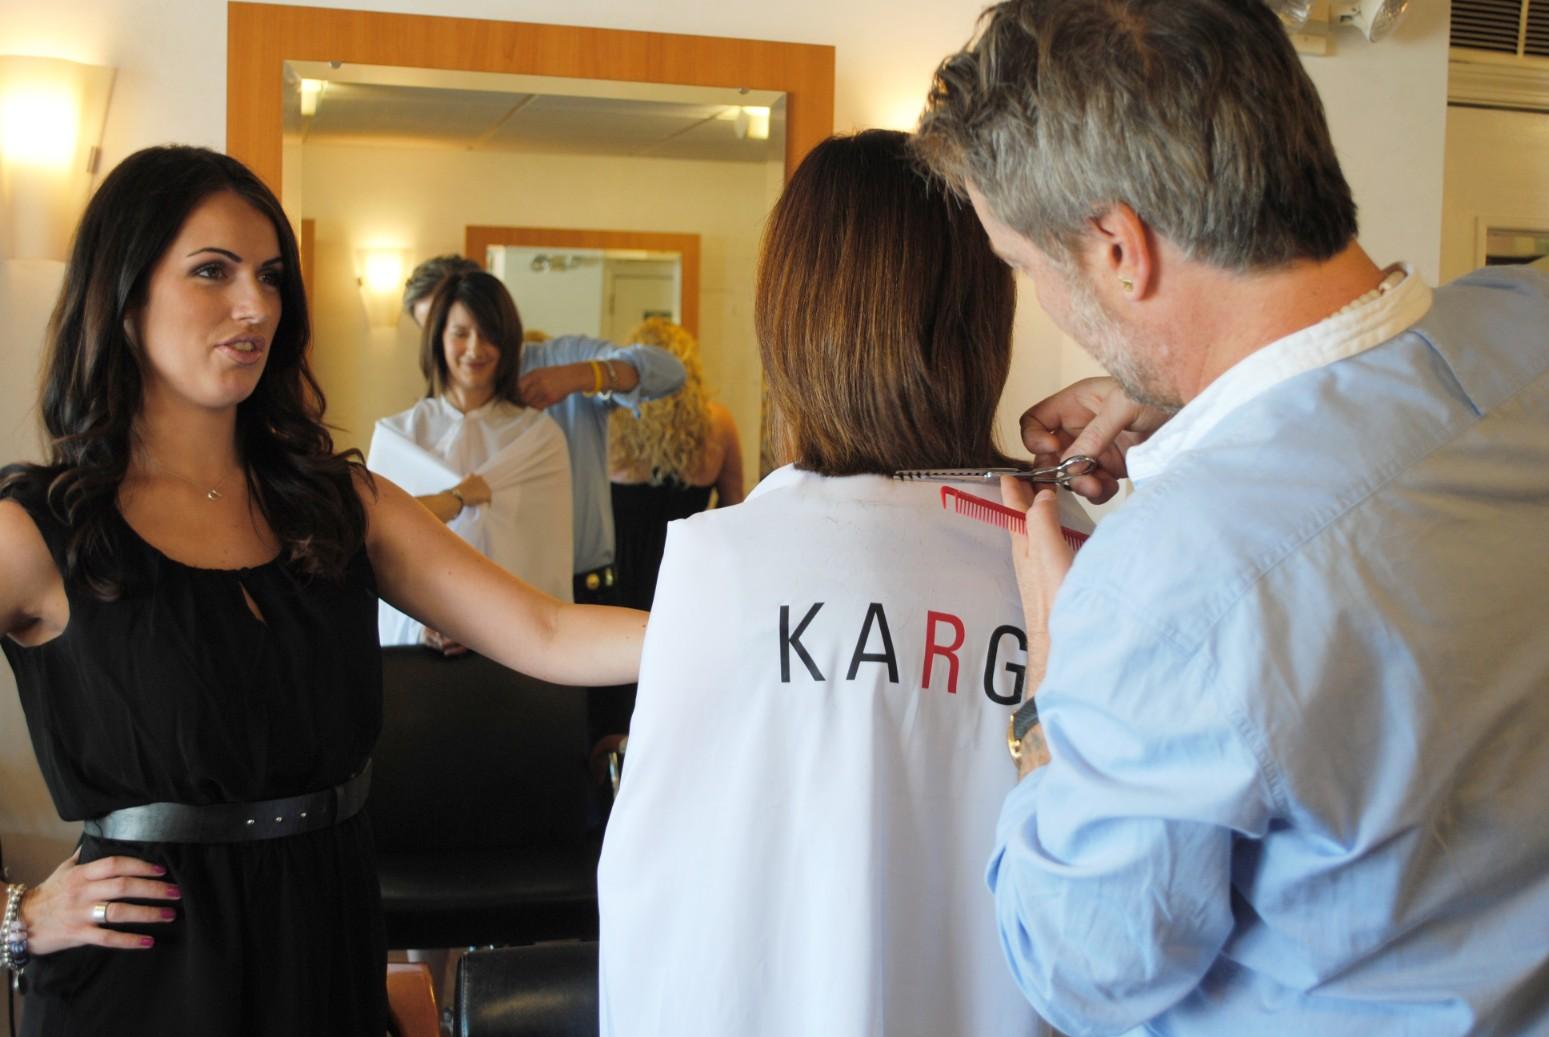 KARG DryHairCut Education at Interlocks - April 2011